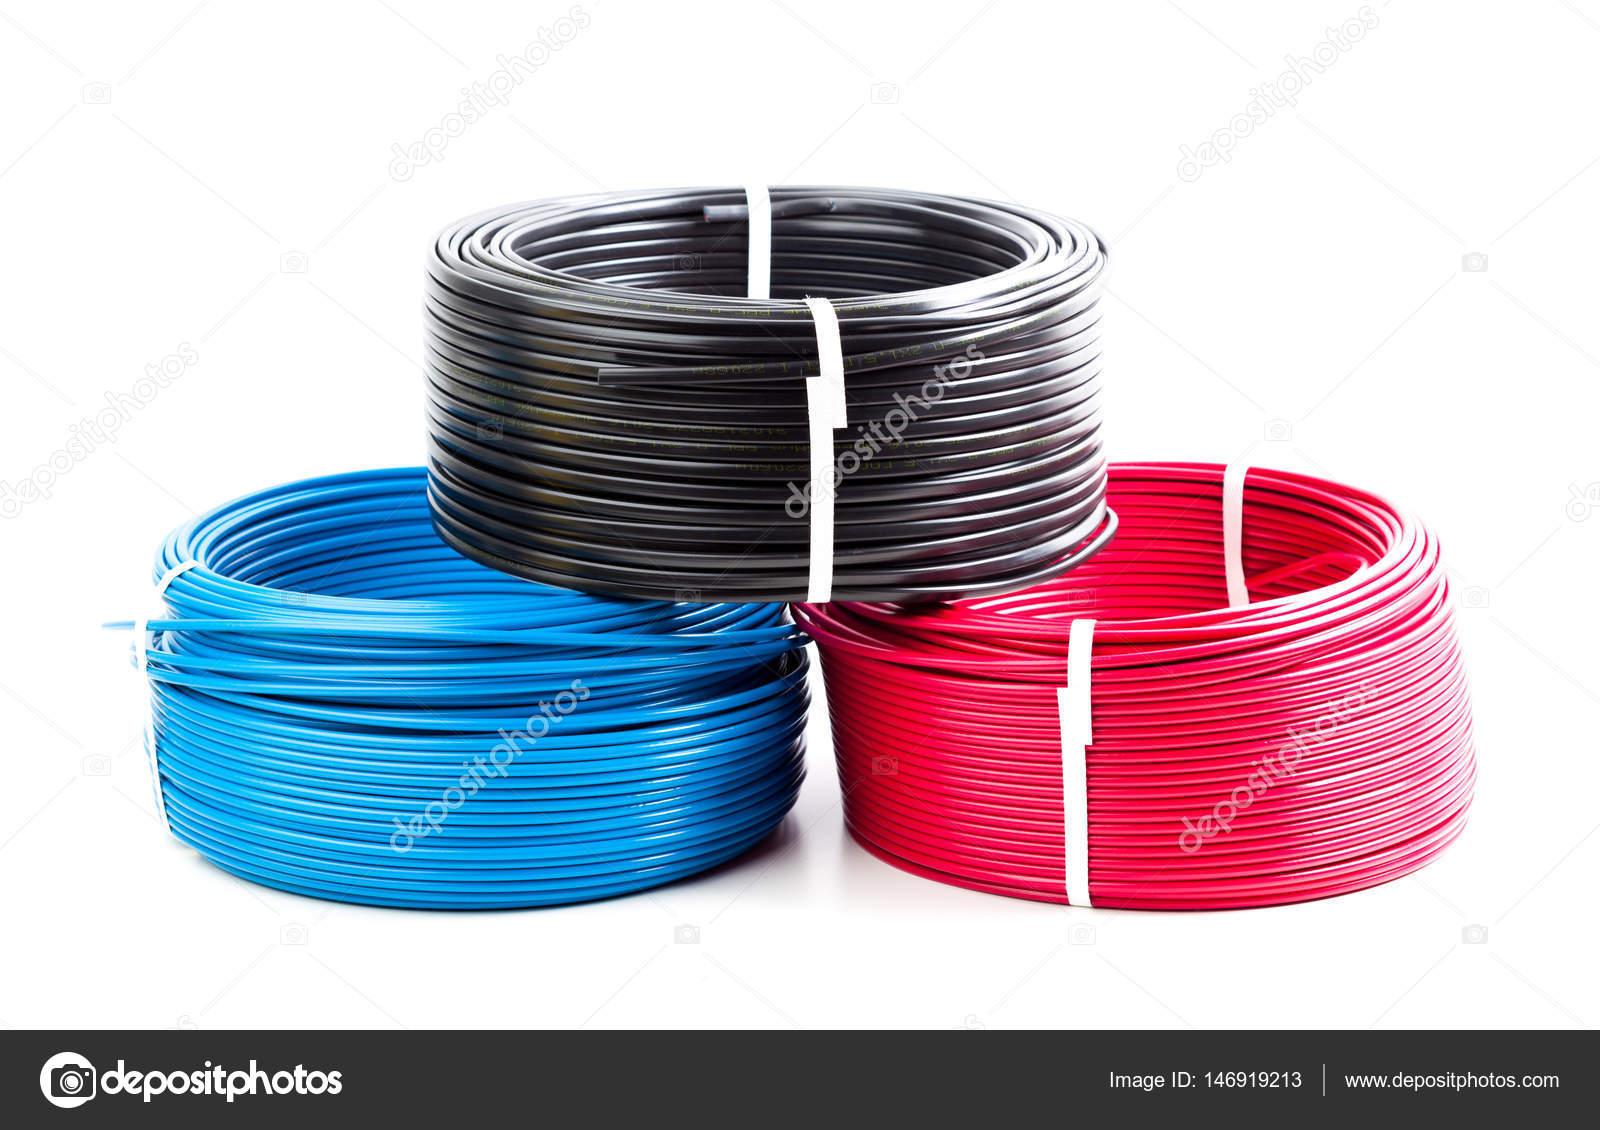 Farbige Elektrokabel farbige kabel stockfoto fotofabrika 146919213